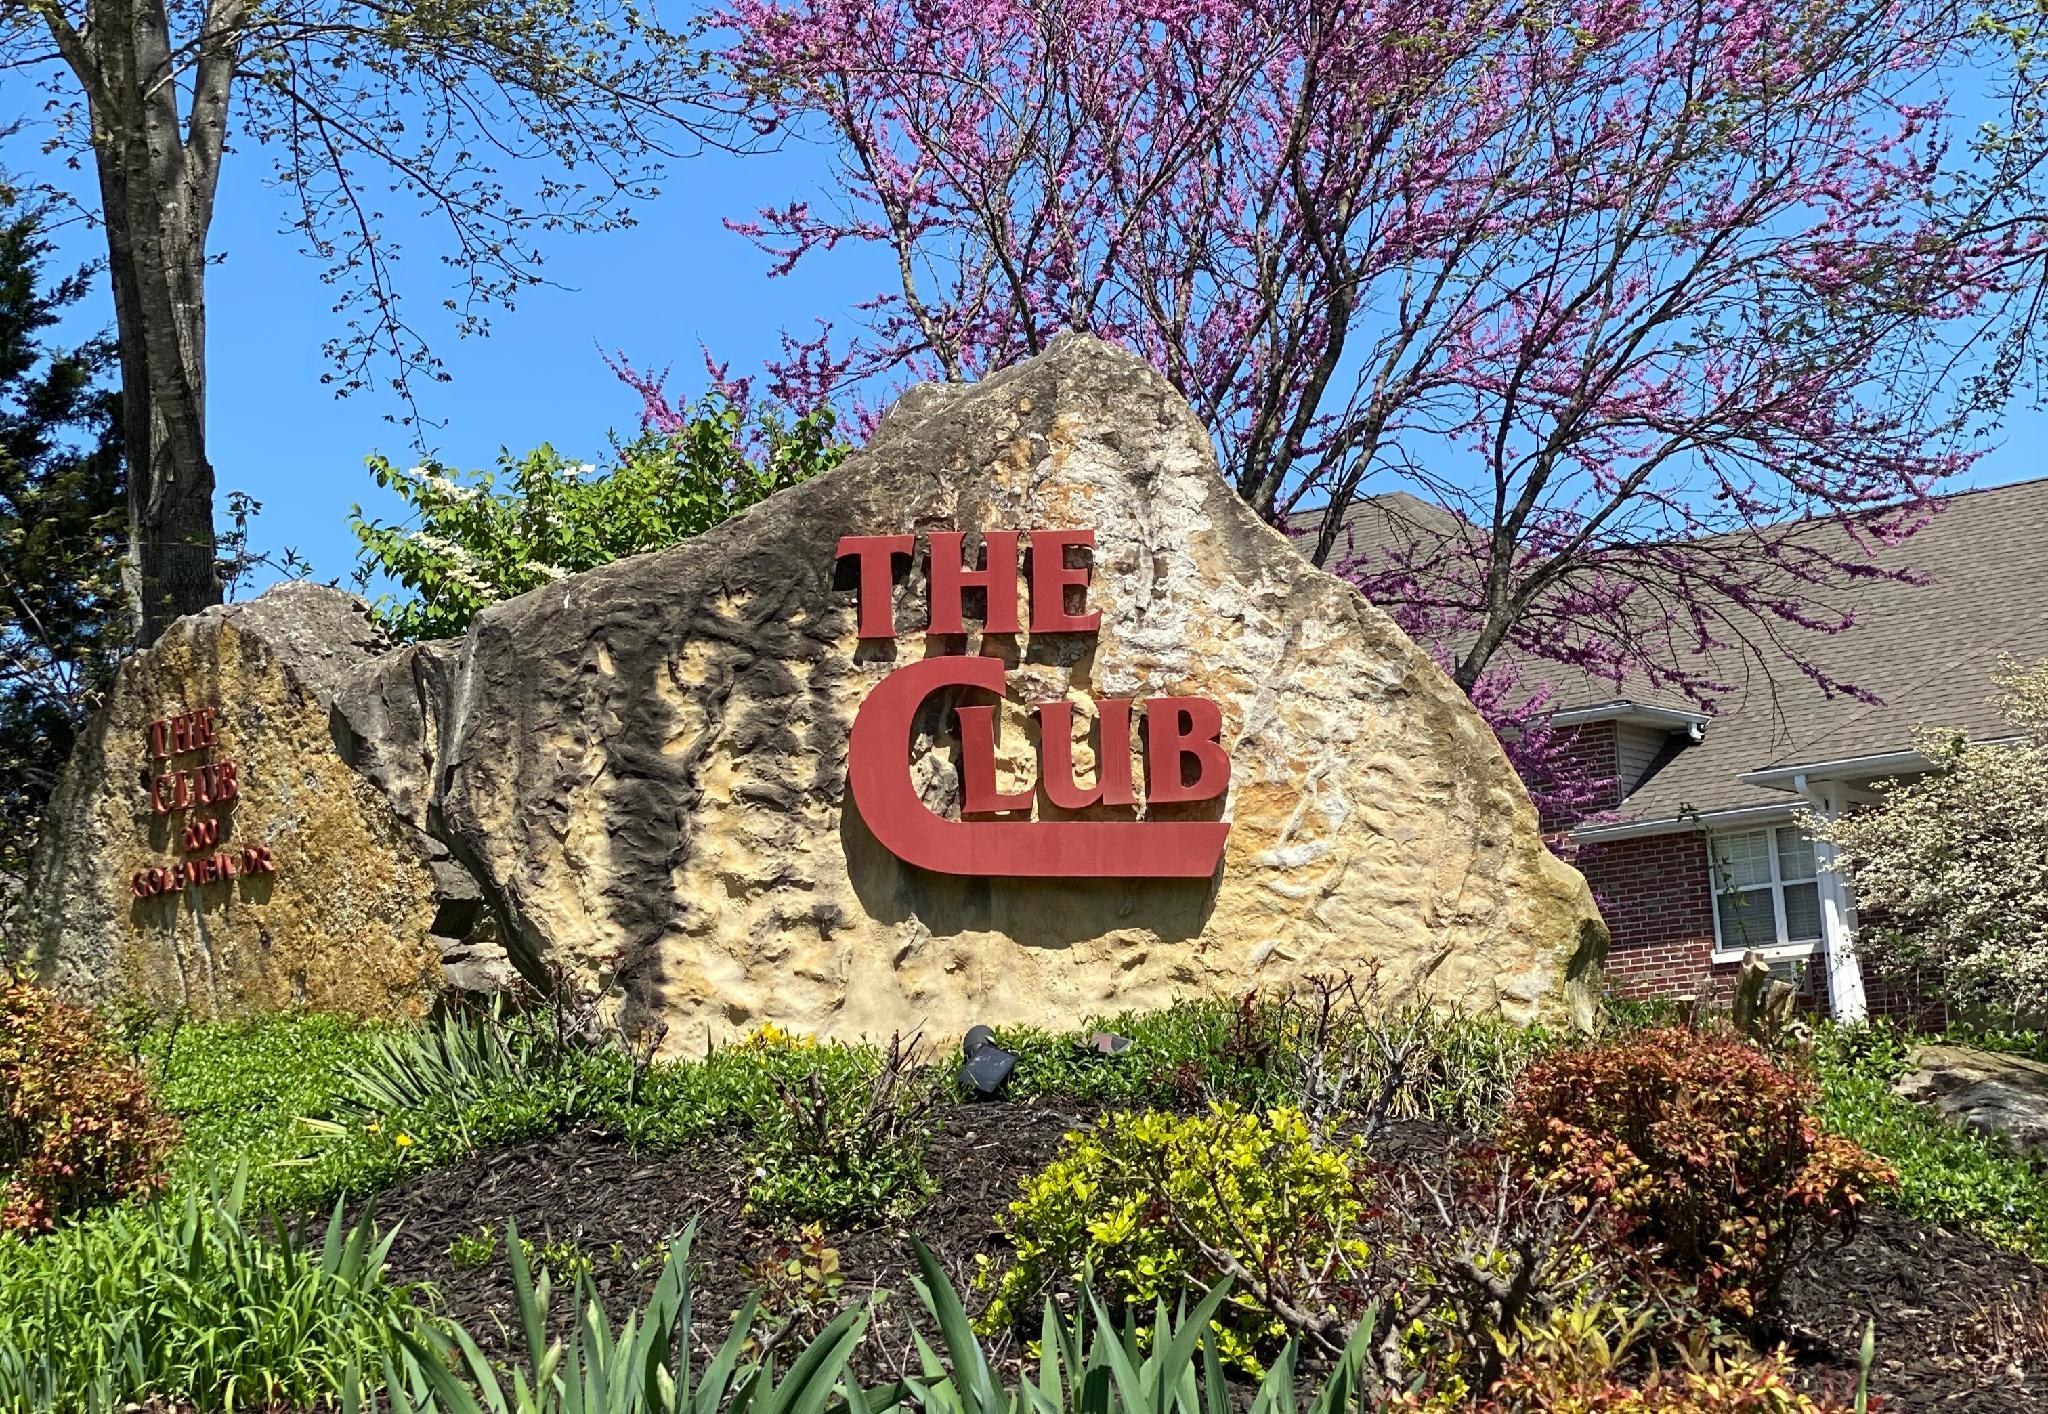 2 Bedroom Walk In Condo, Near the Strip, 1000 Hills Golf View Sleeps 8 : Club A-6